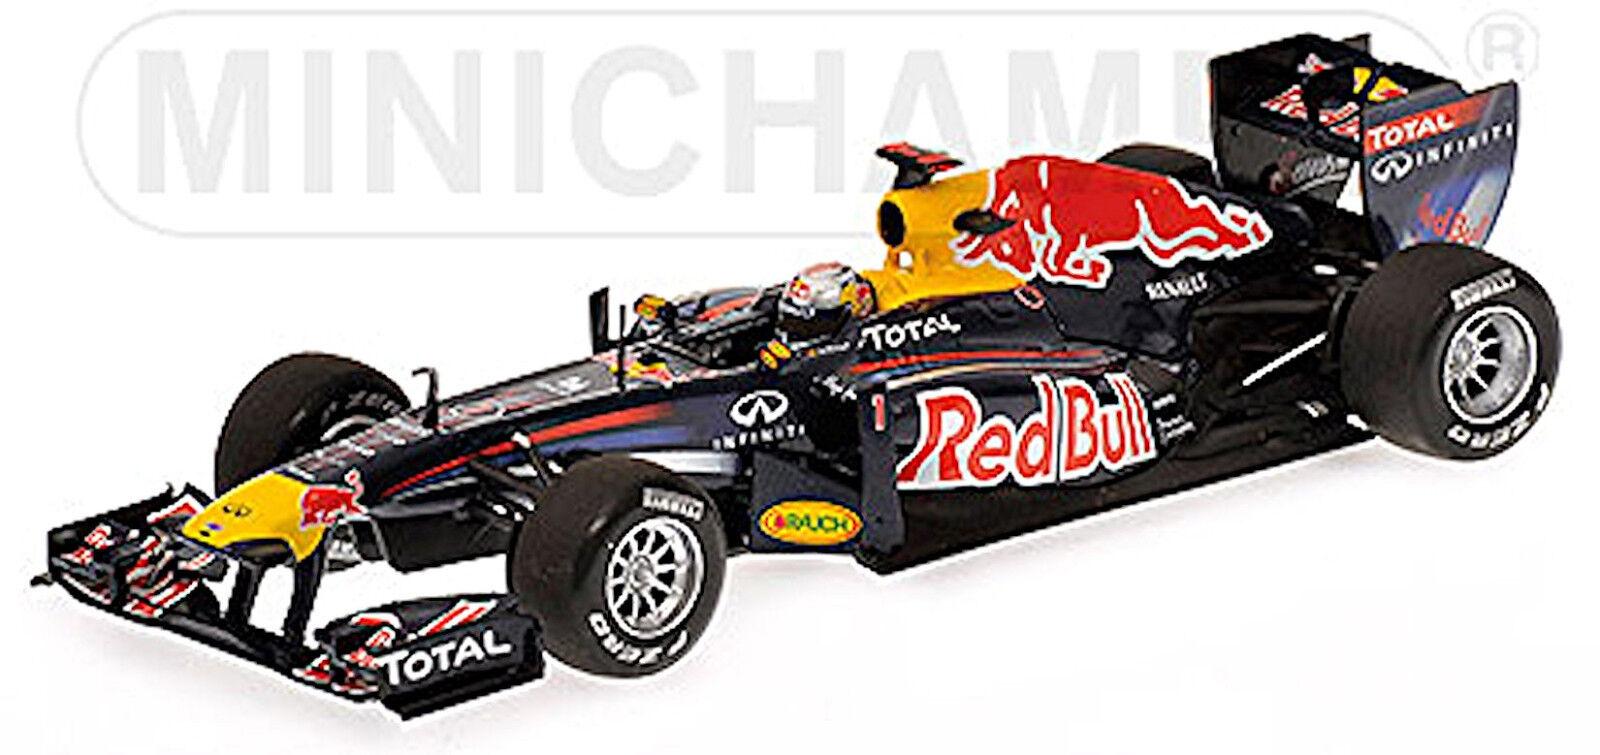 Red Bull Racing Renault rb7 Sebastian ciabatta #1 WINNER Malaysian GP 1:43 MINICHA